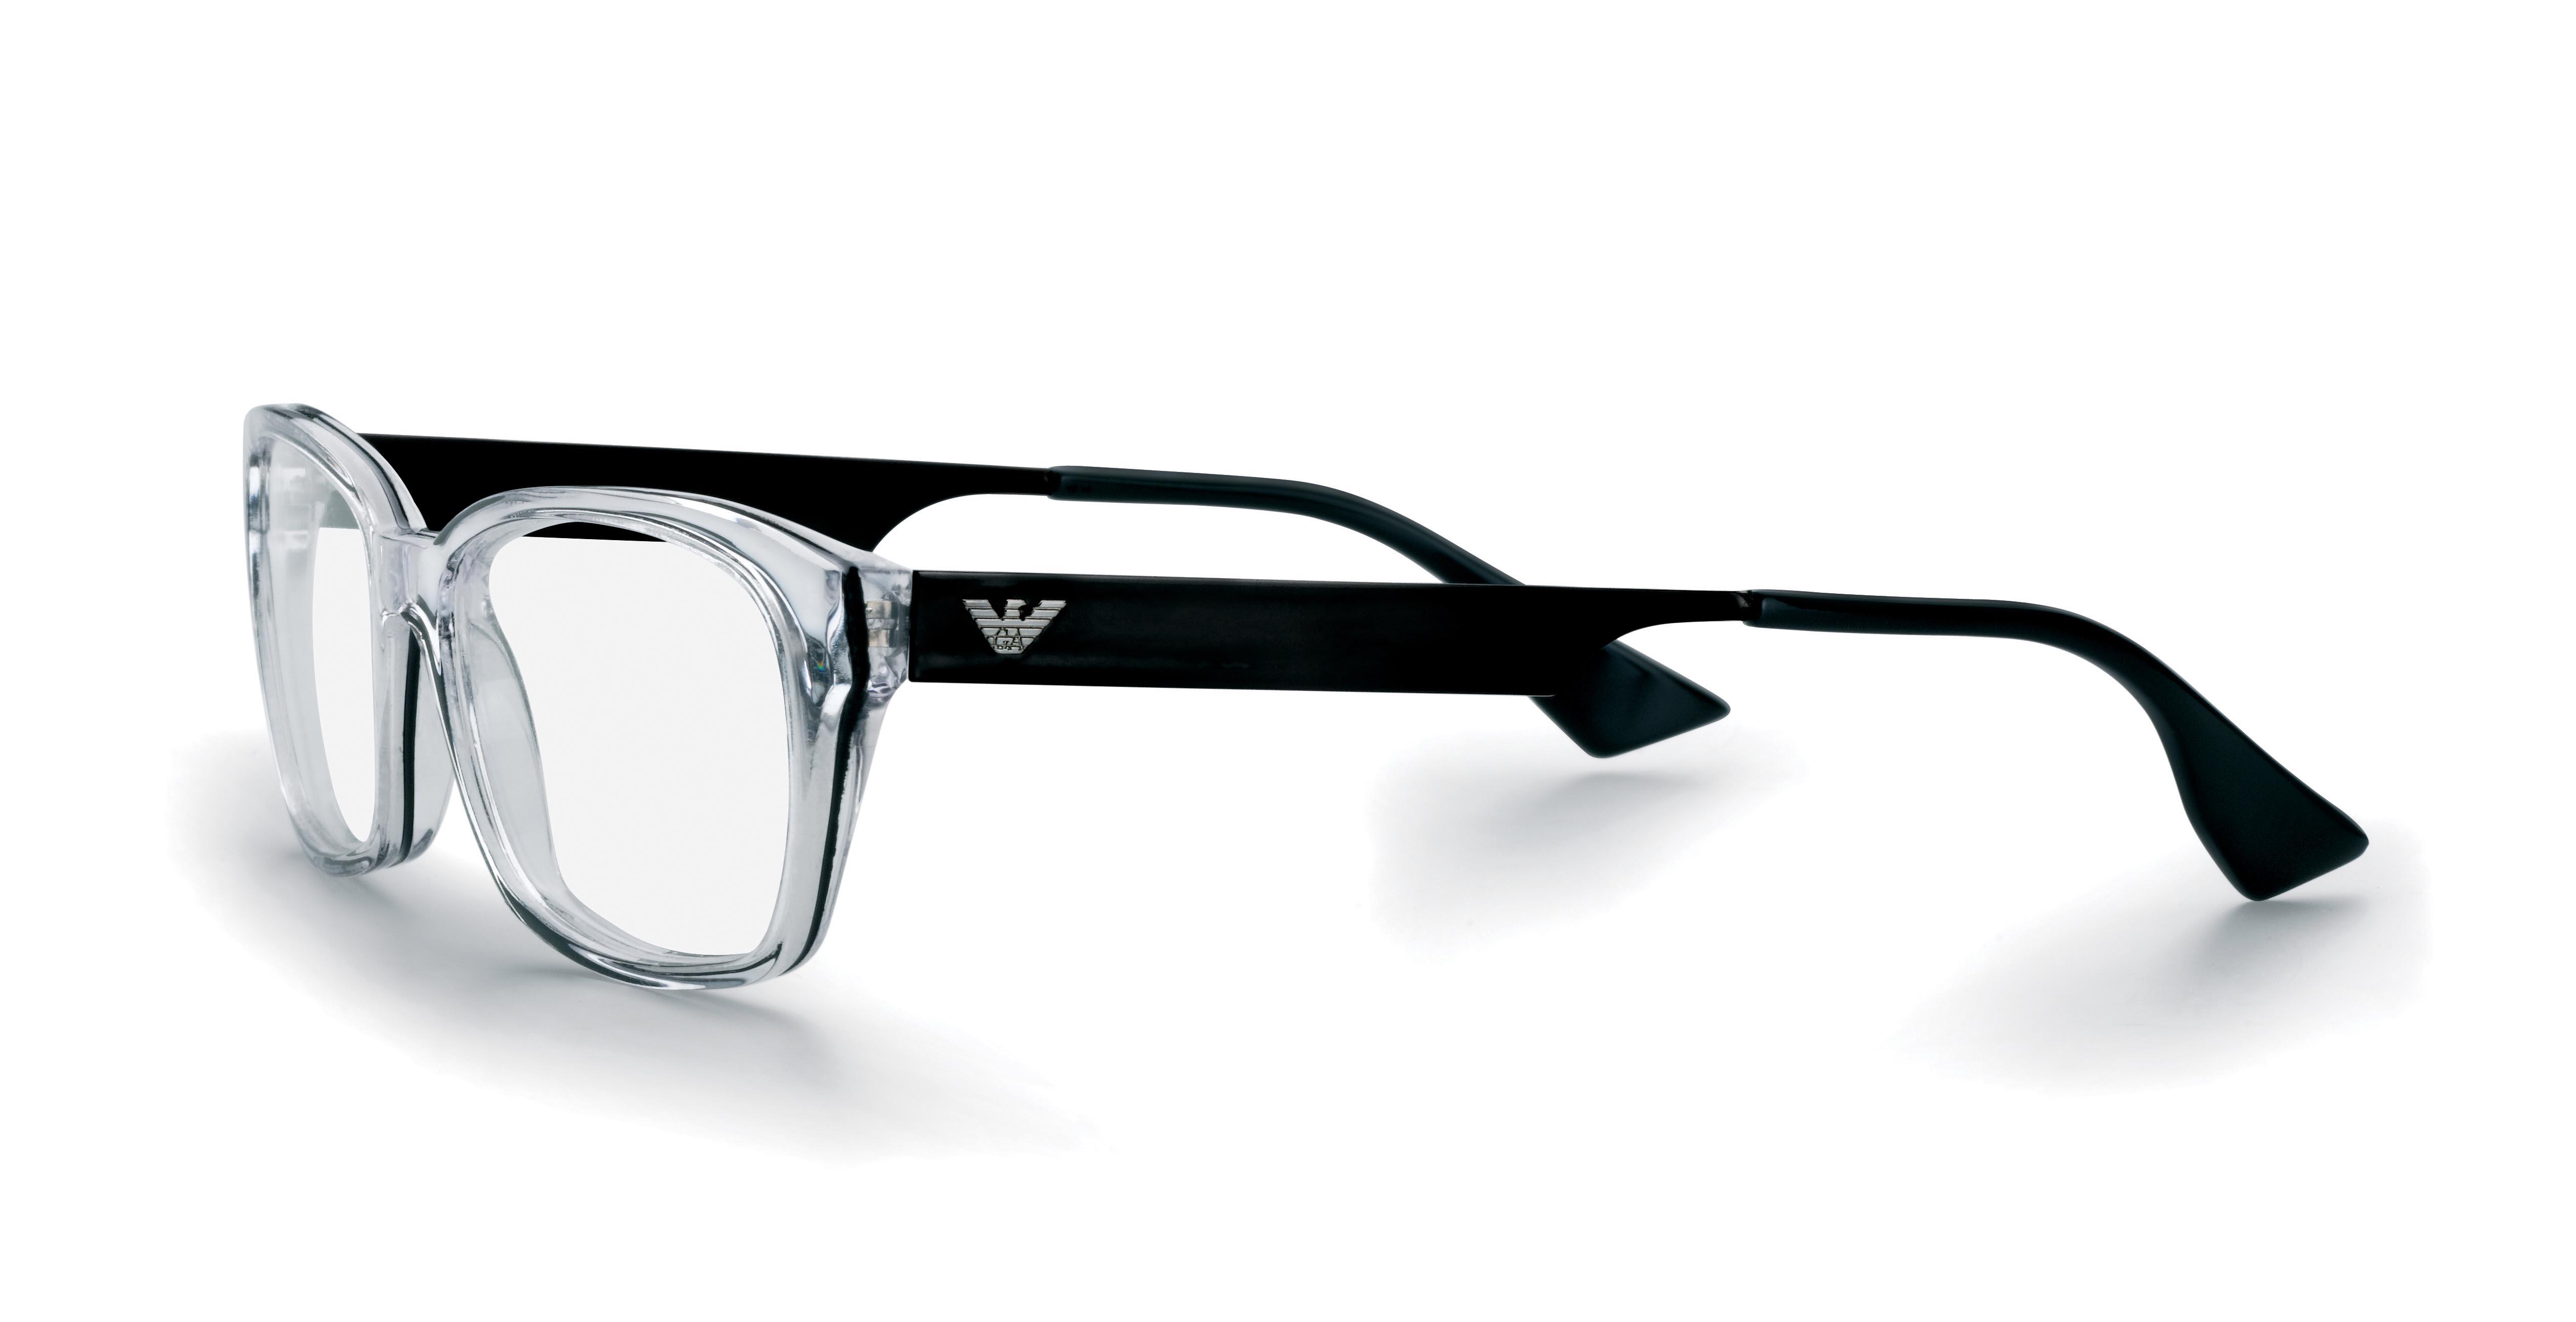 New EMPORIO ARMANI Fall Collection – Eyecessorize